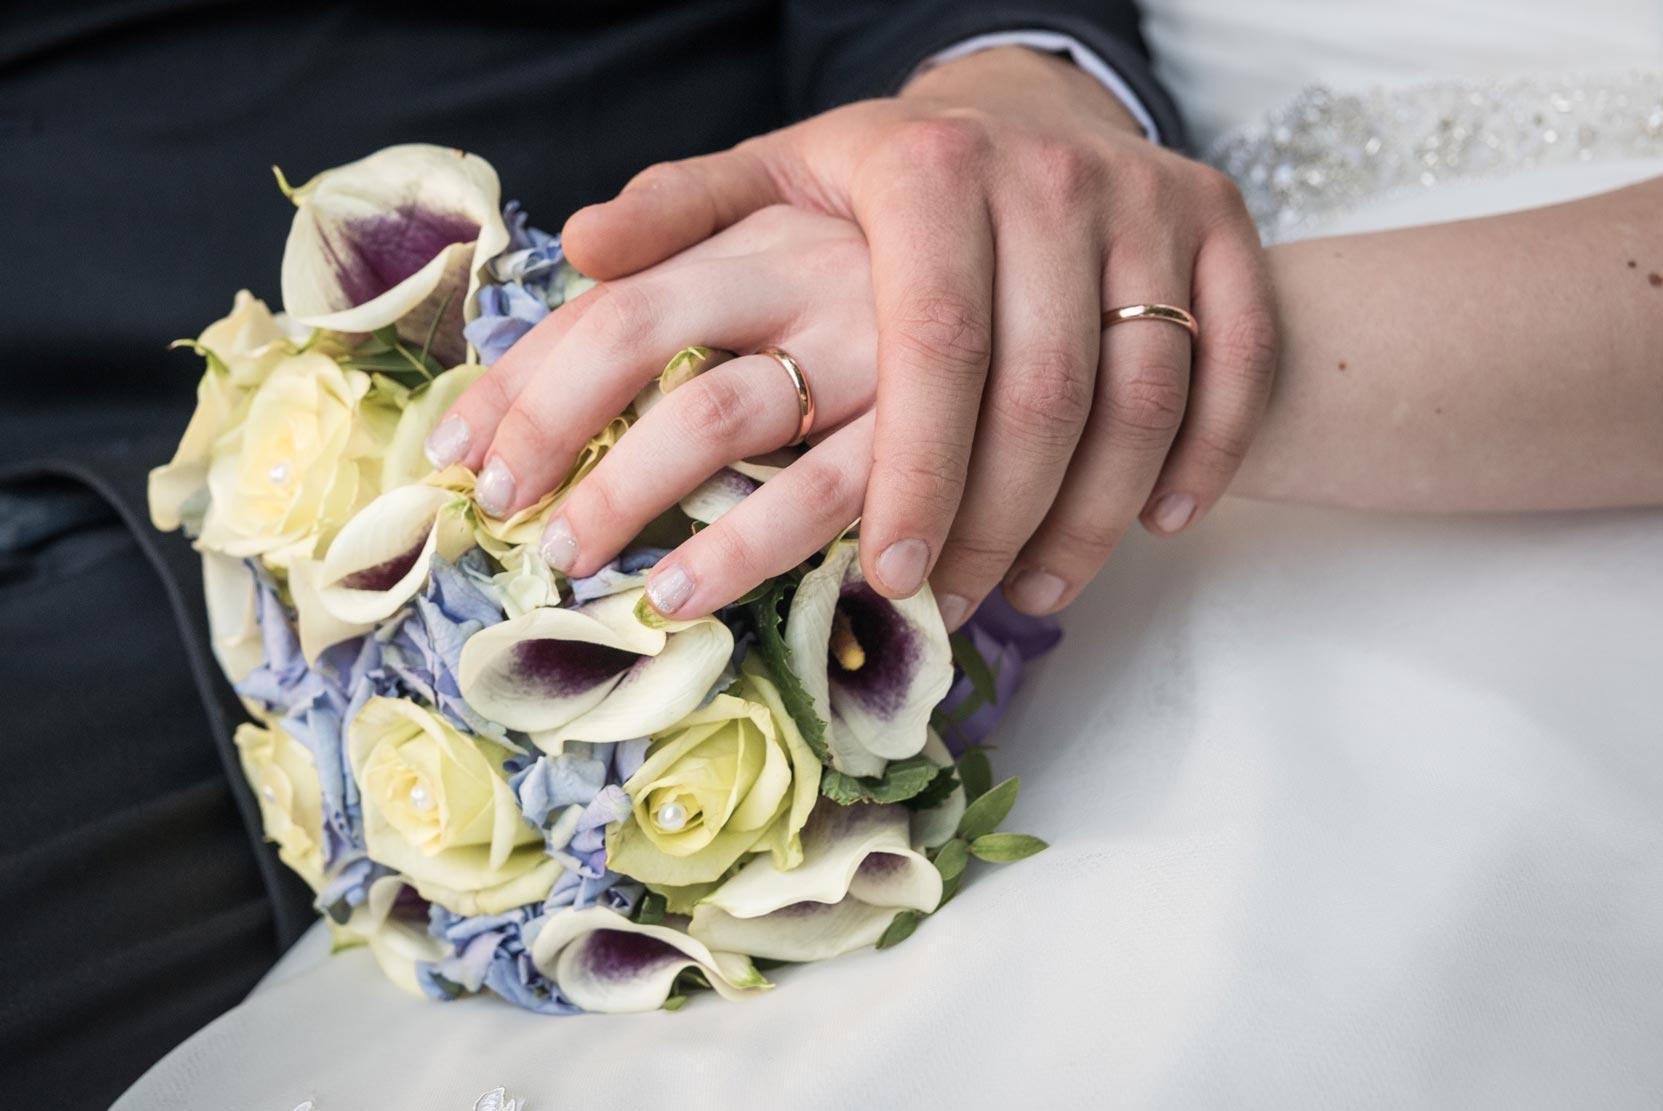 Matrimonio a Narzole Lorenza Diego - DSC 3341 - Fotografo matrimonio Nord Italia - Fotografo matrimonio Nord Italia